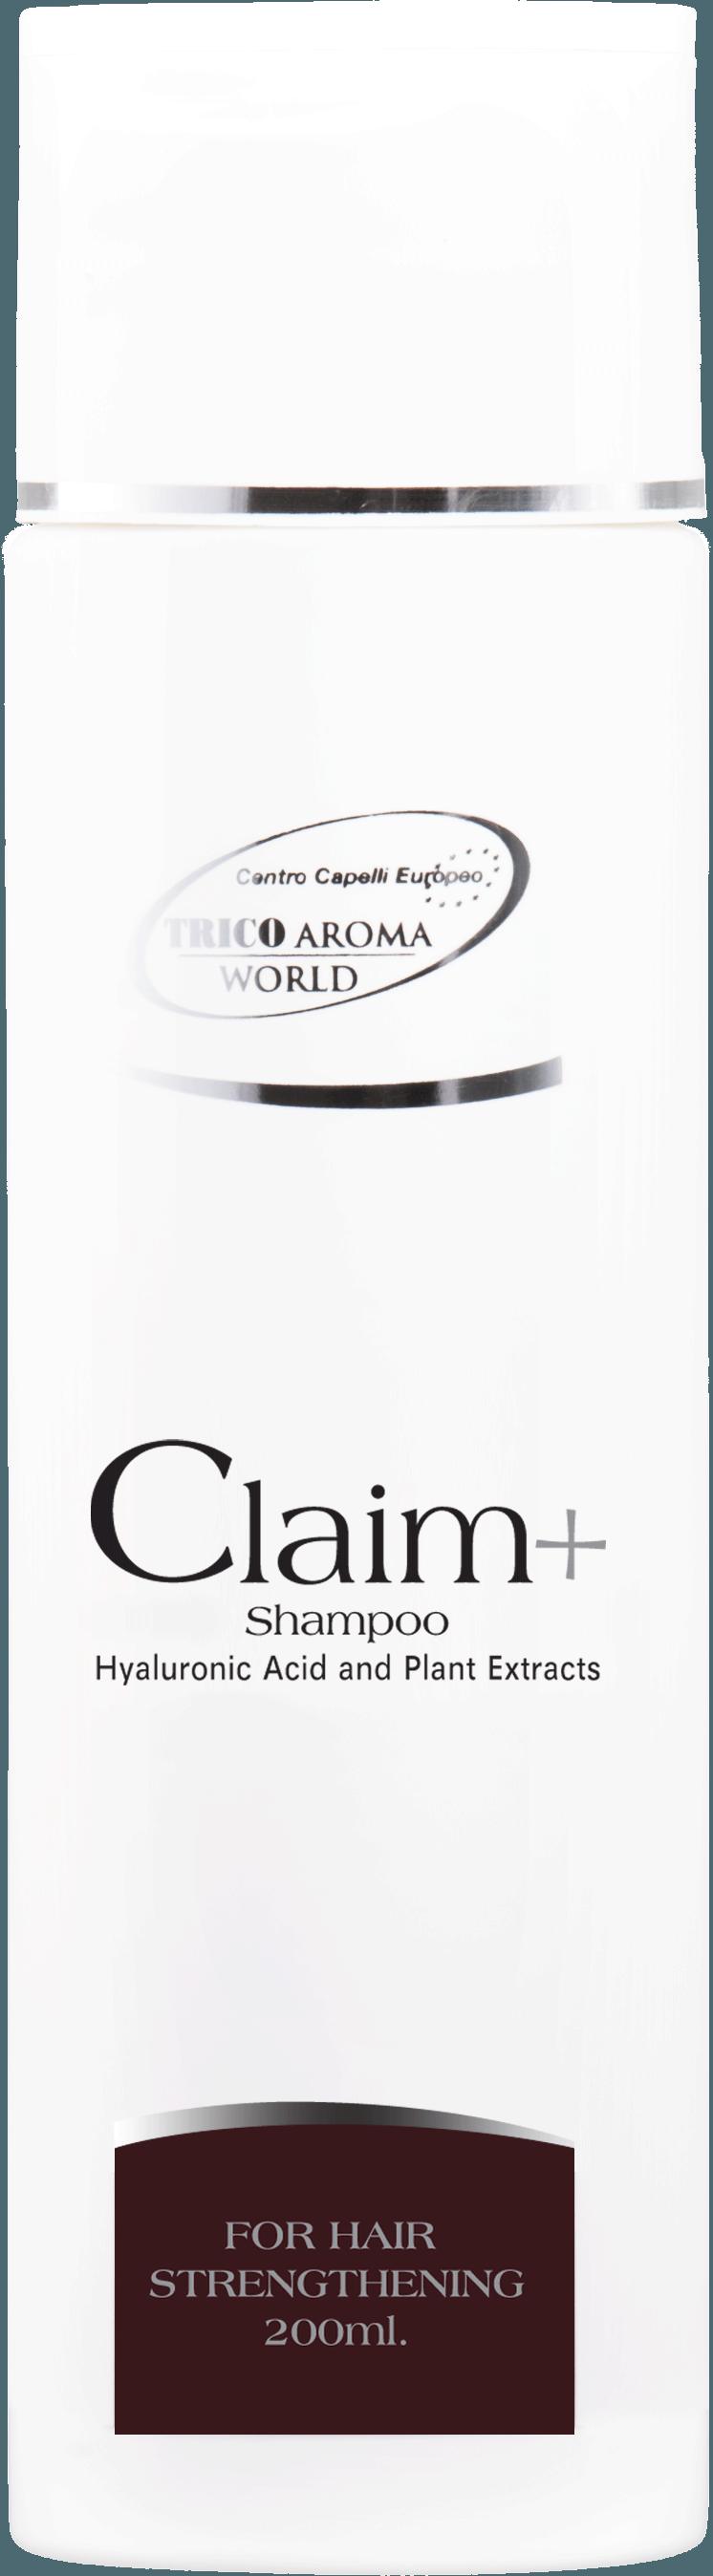 Claim+ Shampoo